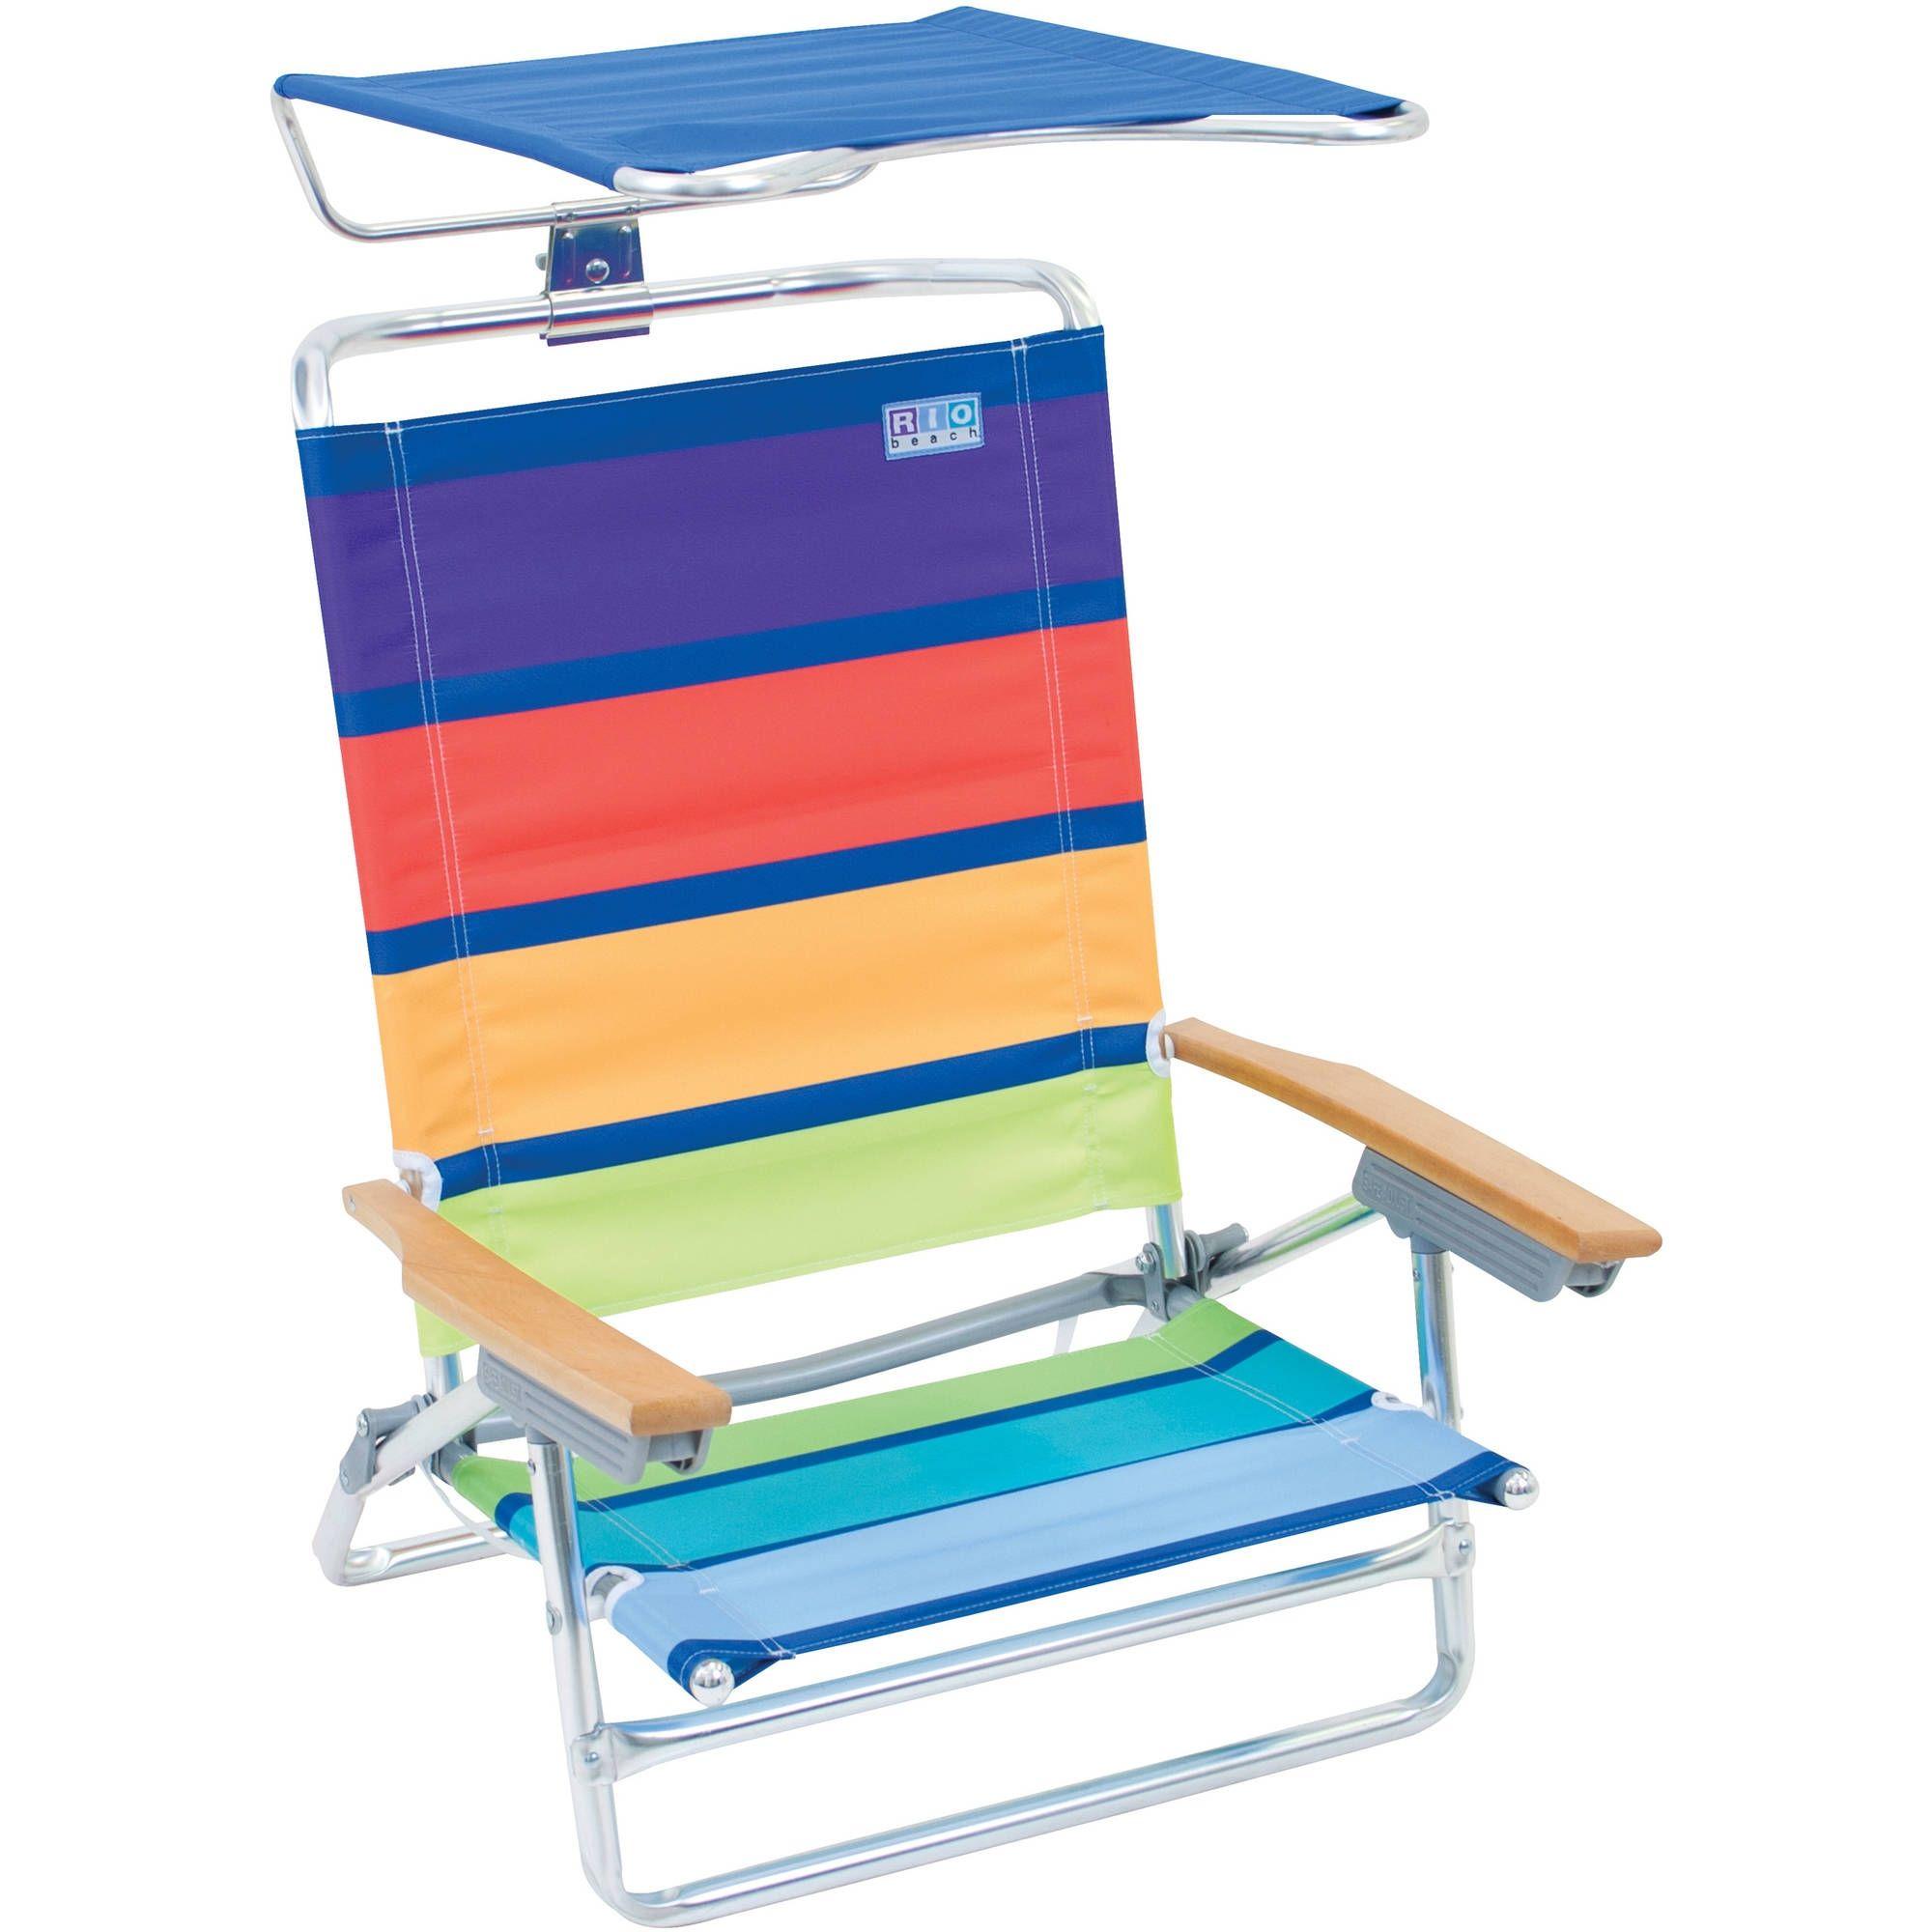 Rio Beach Folding Chair With Canopy